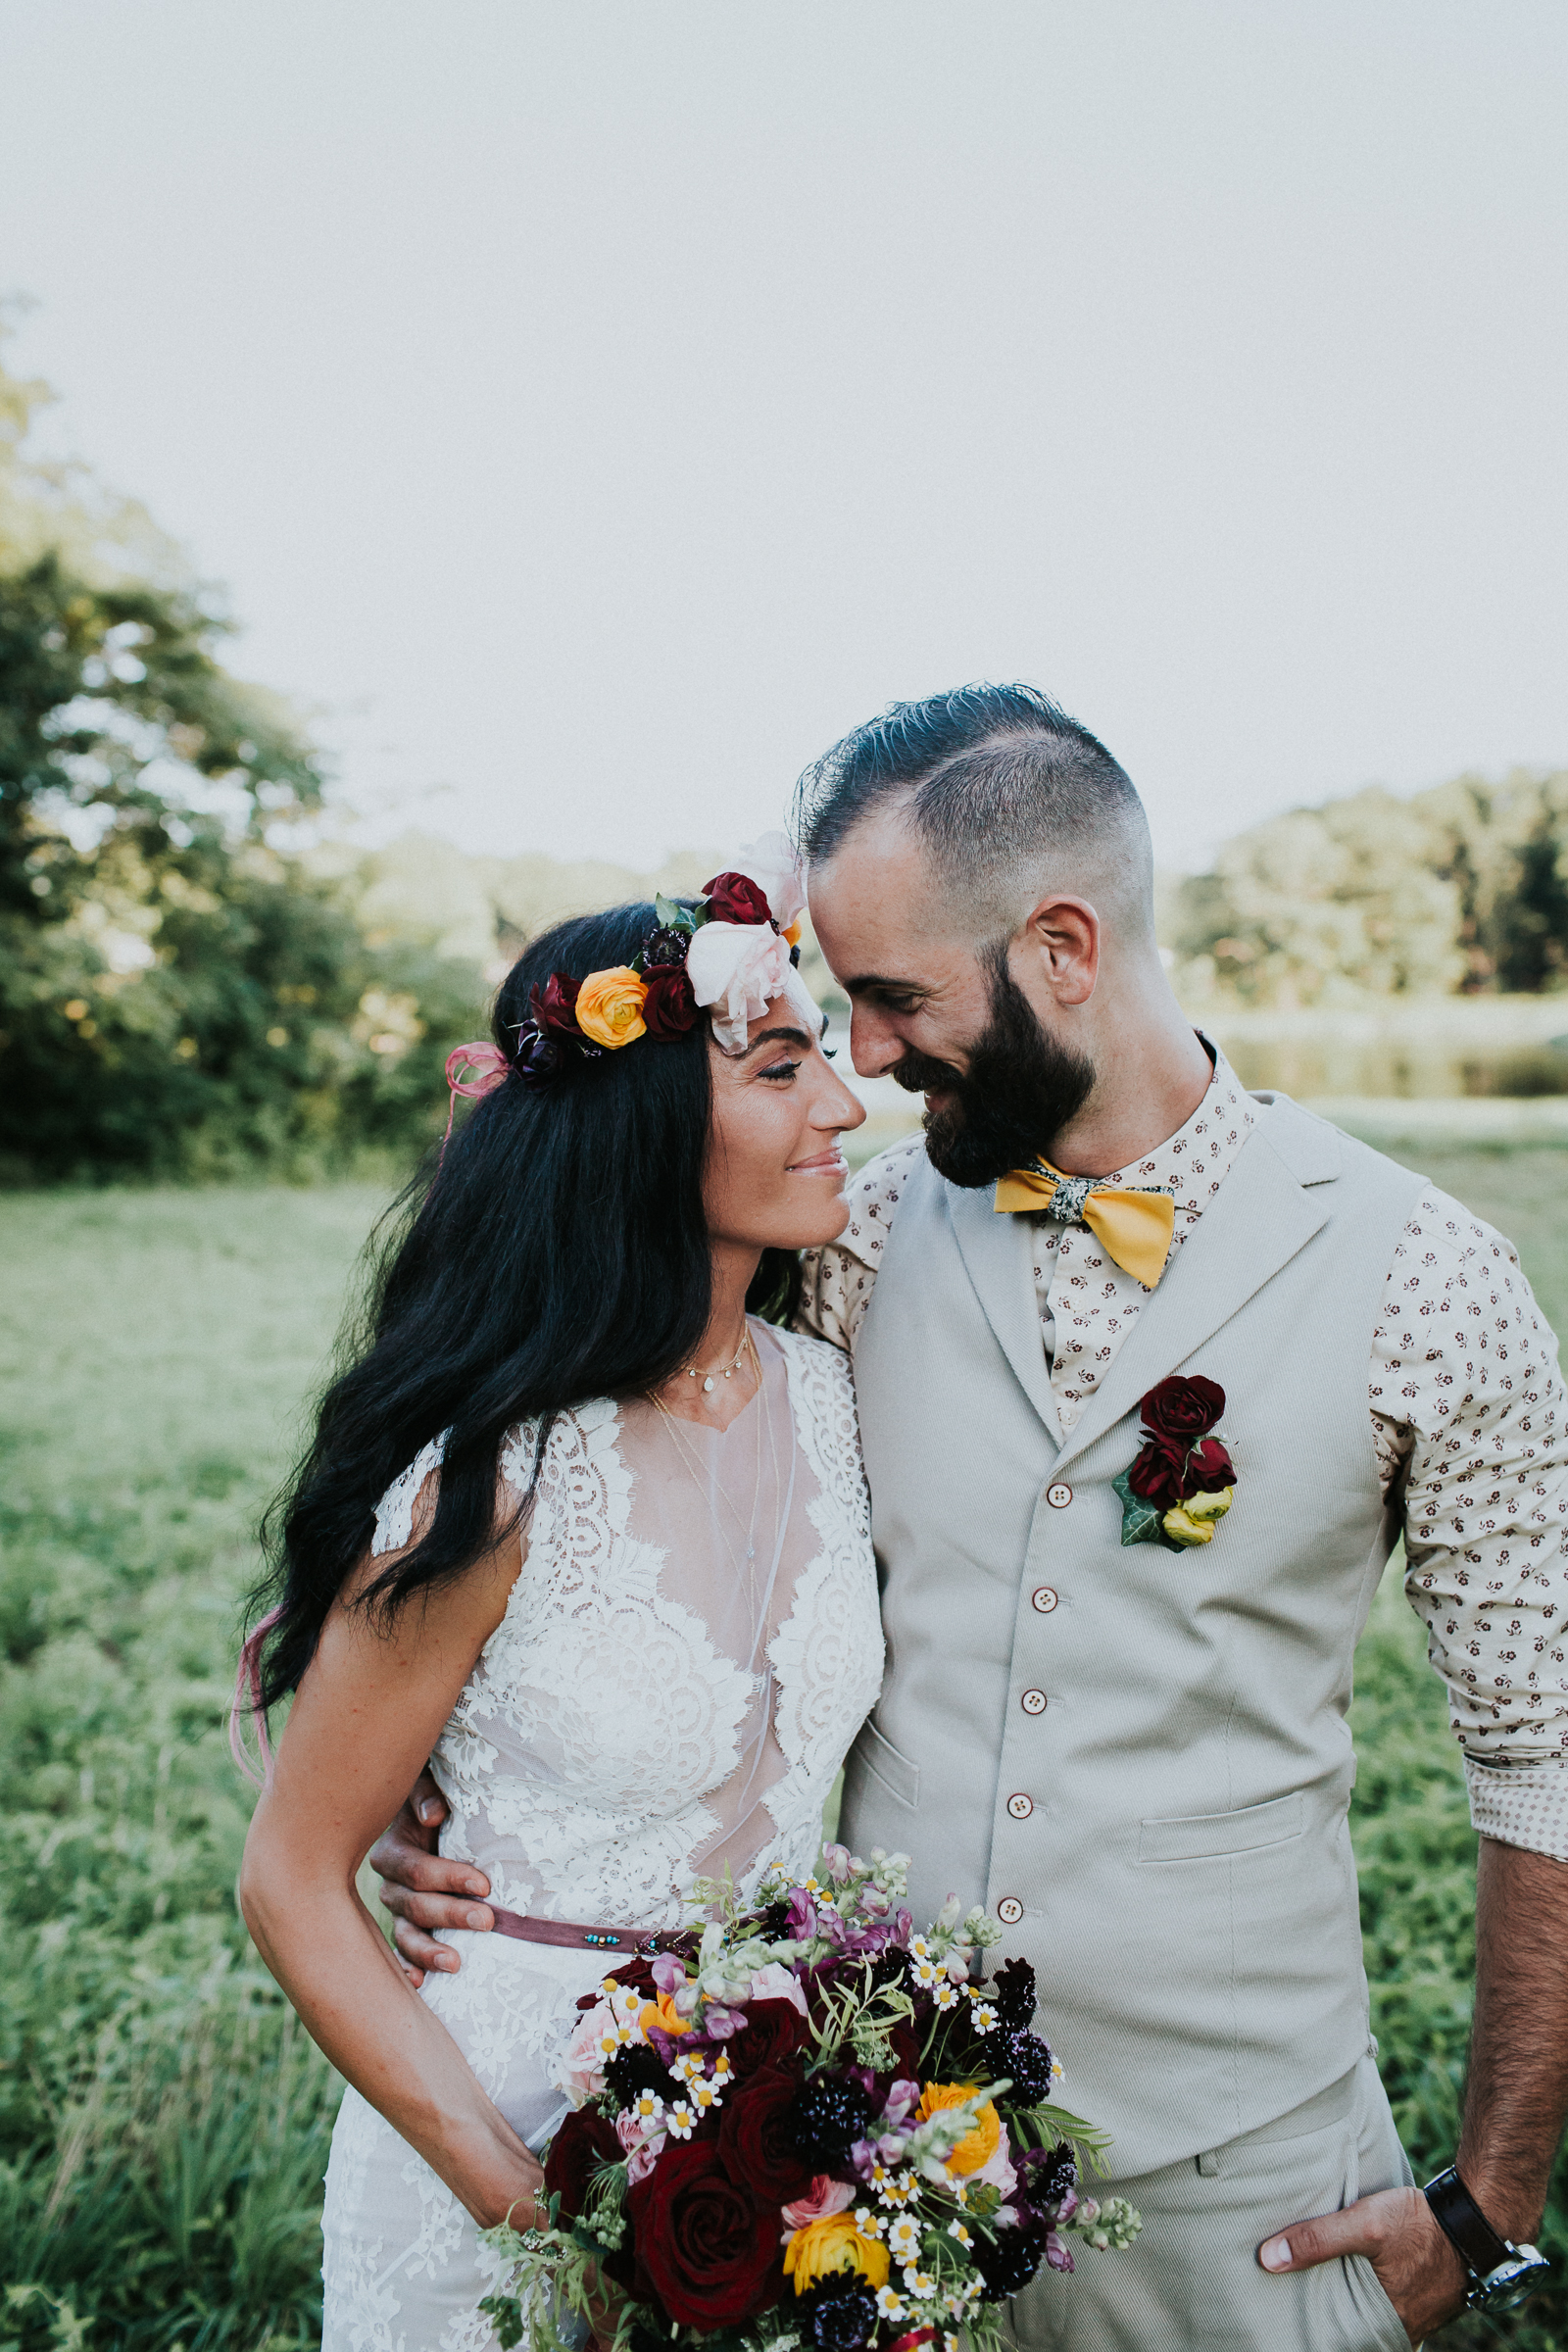 Backyard-Intimate-Adventurous-Destination-Wedding-Darien-Connecticut-Documentary-Wedding-Photography-102.jpg